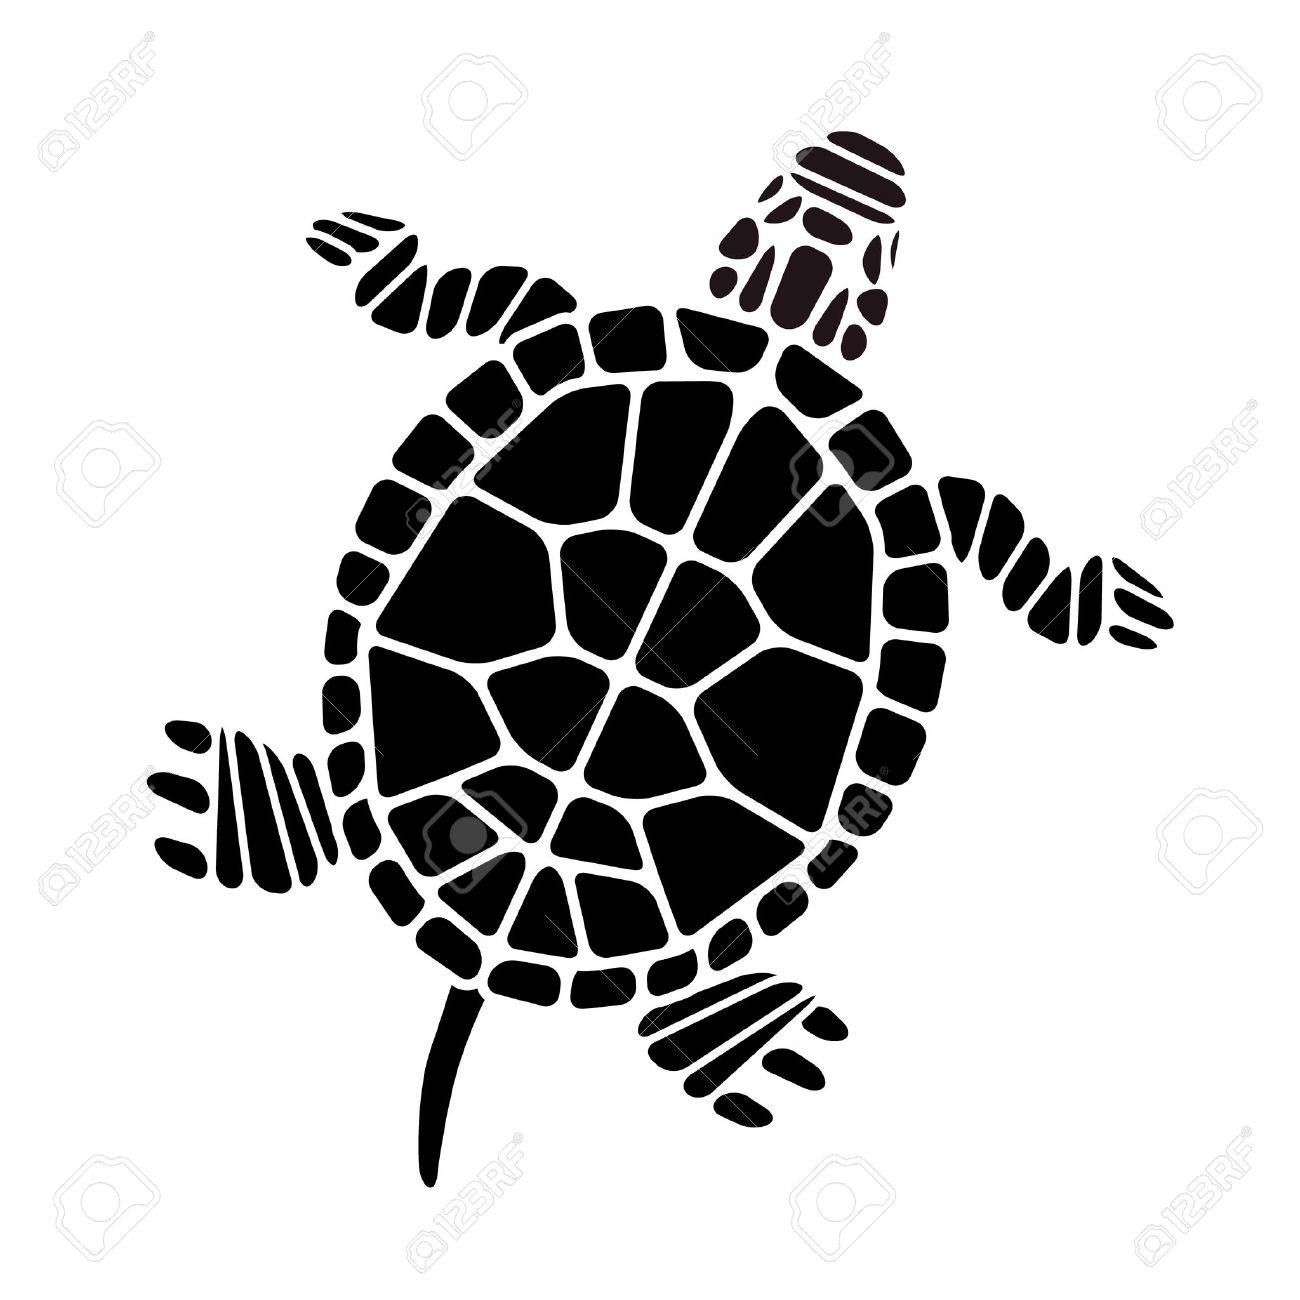 Turtle Silhouette - 34352475